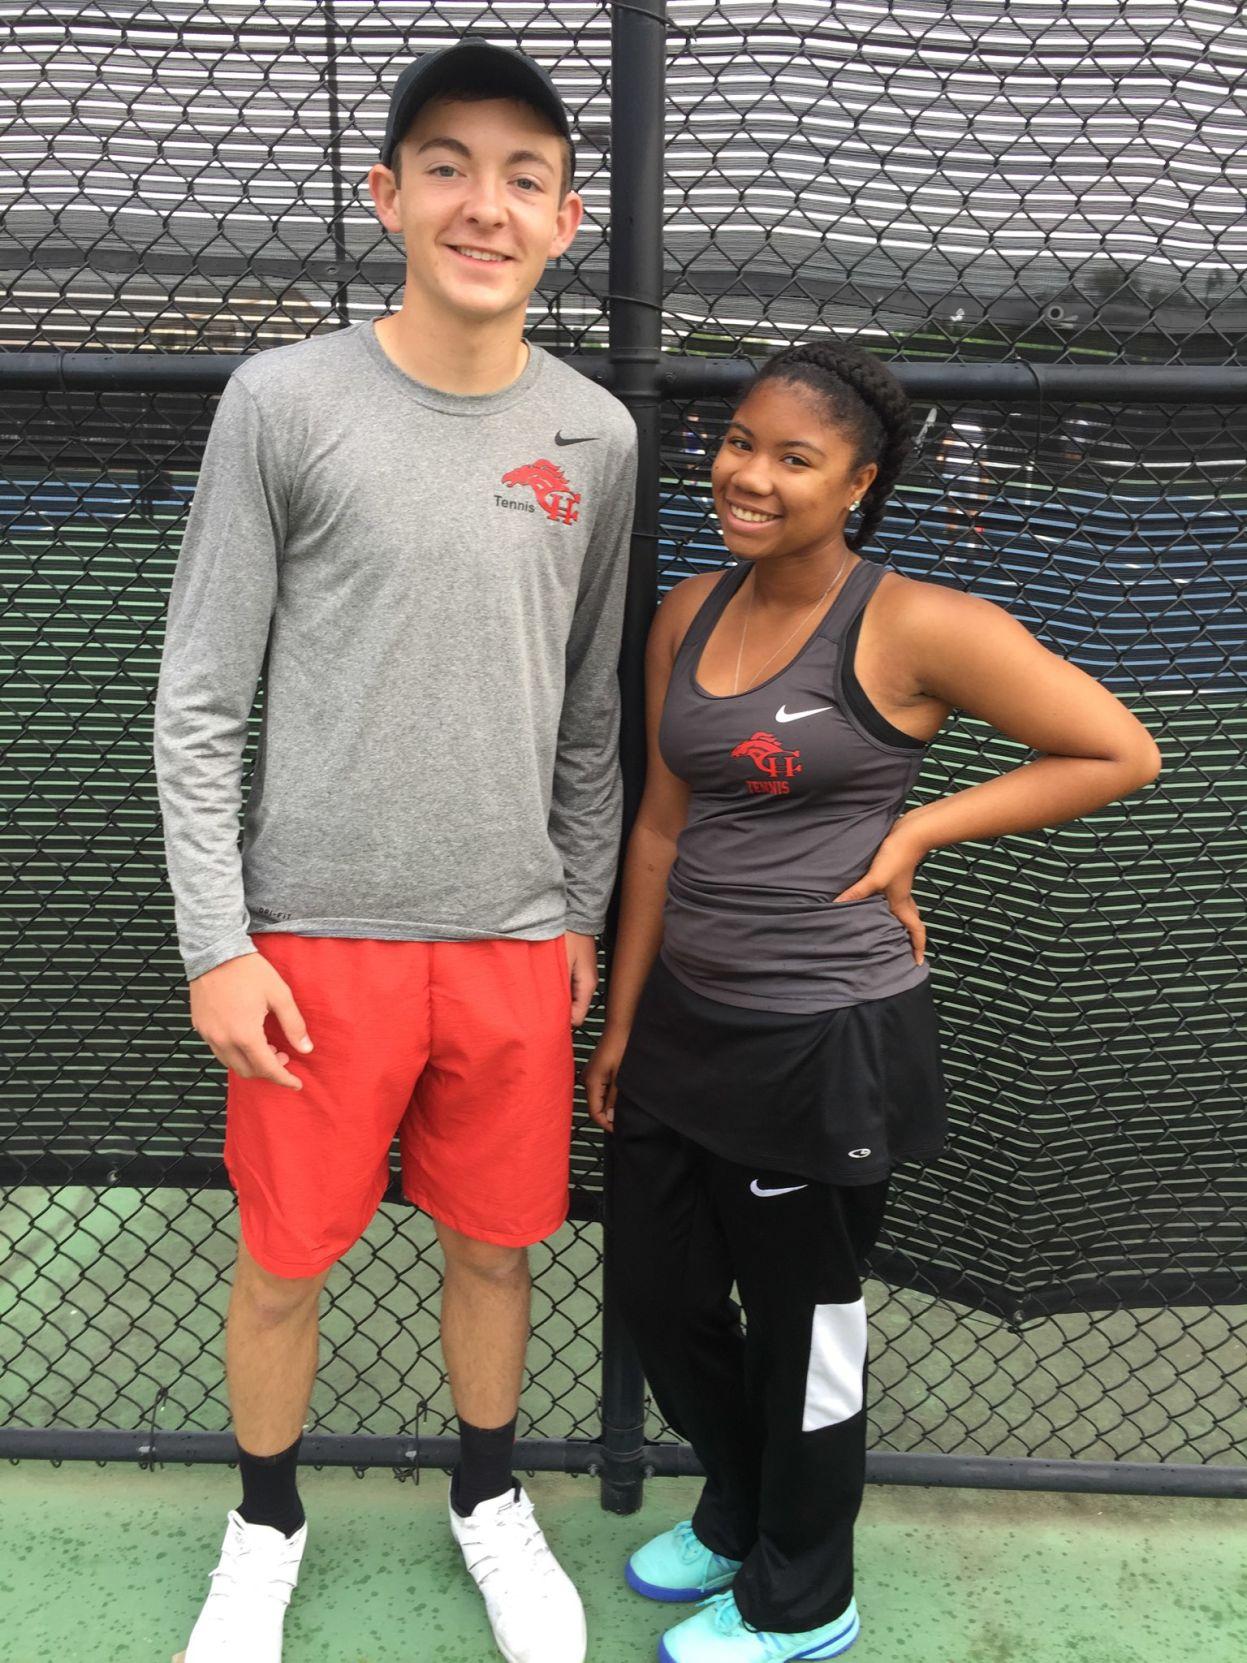 0518 Mikaila Coleman tennis.JPG